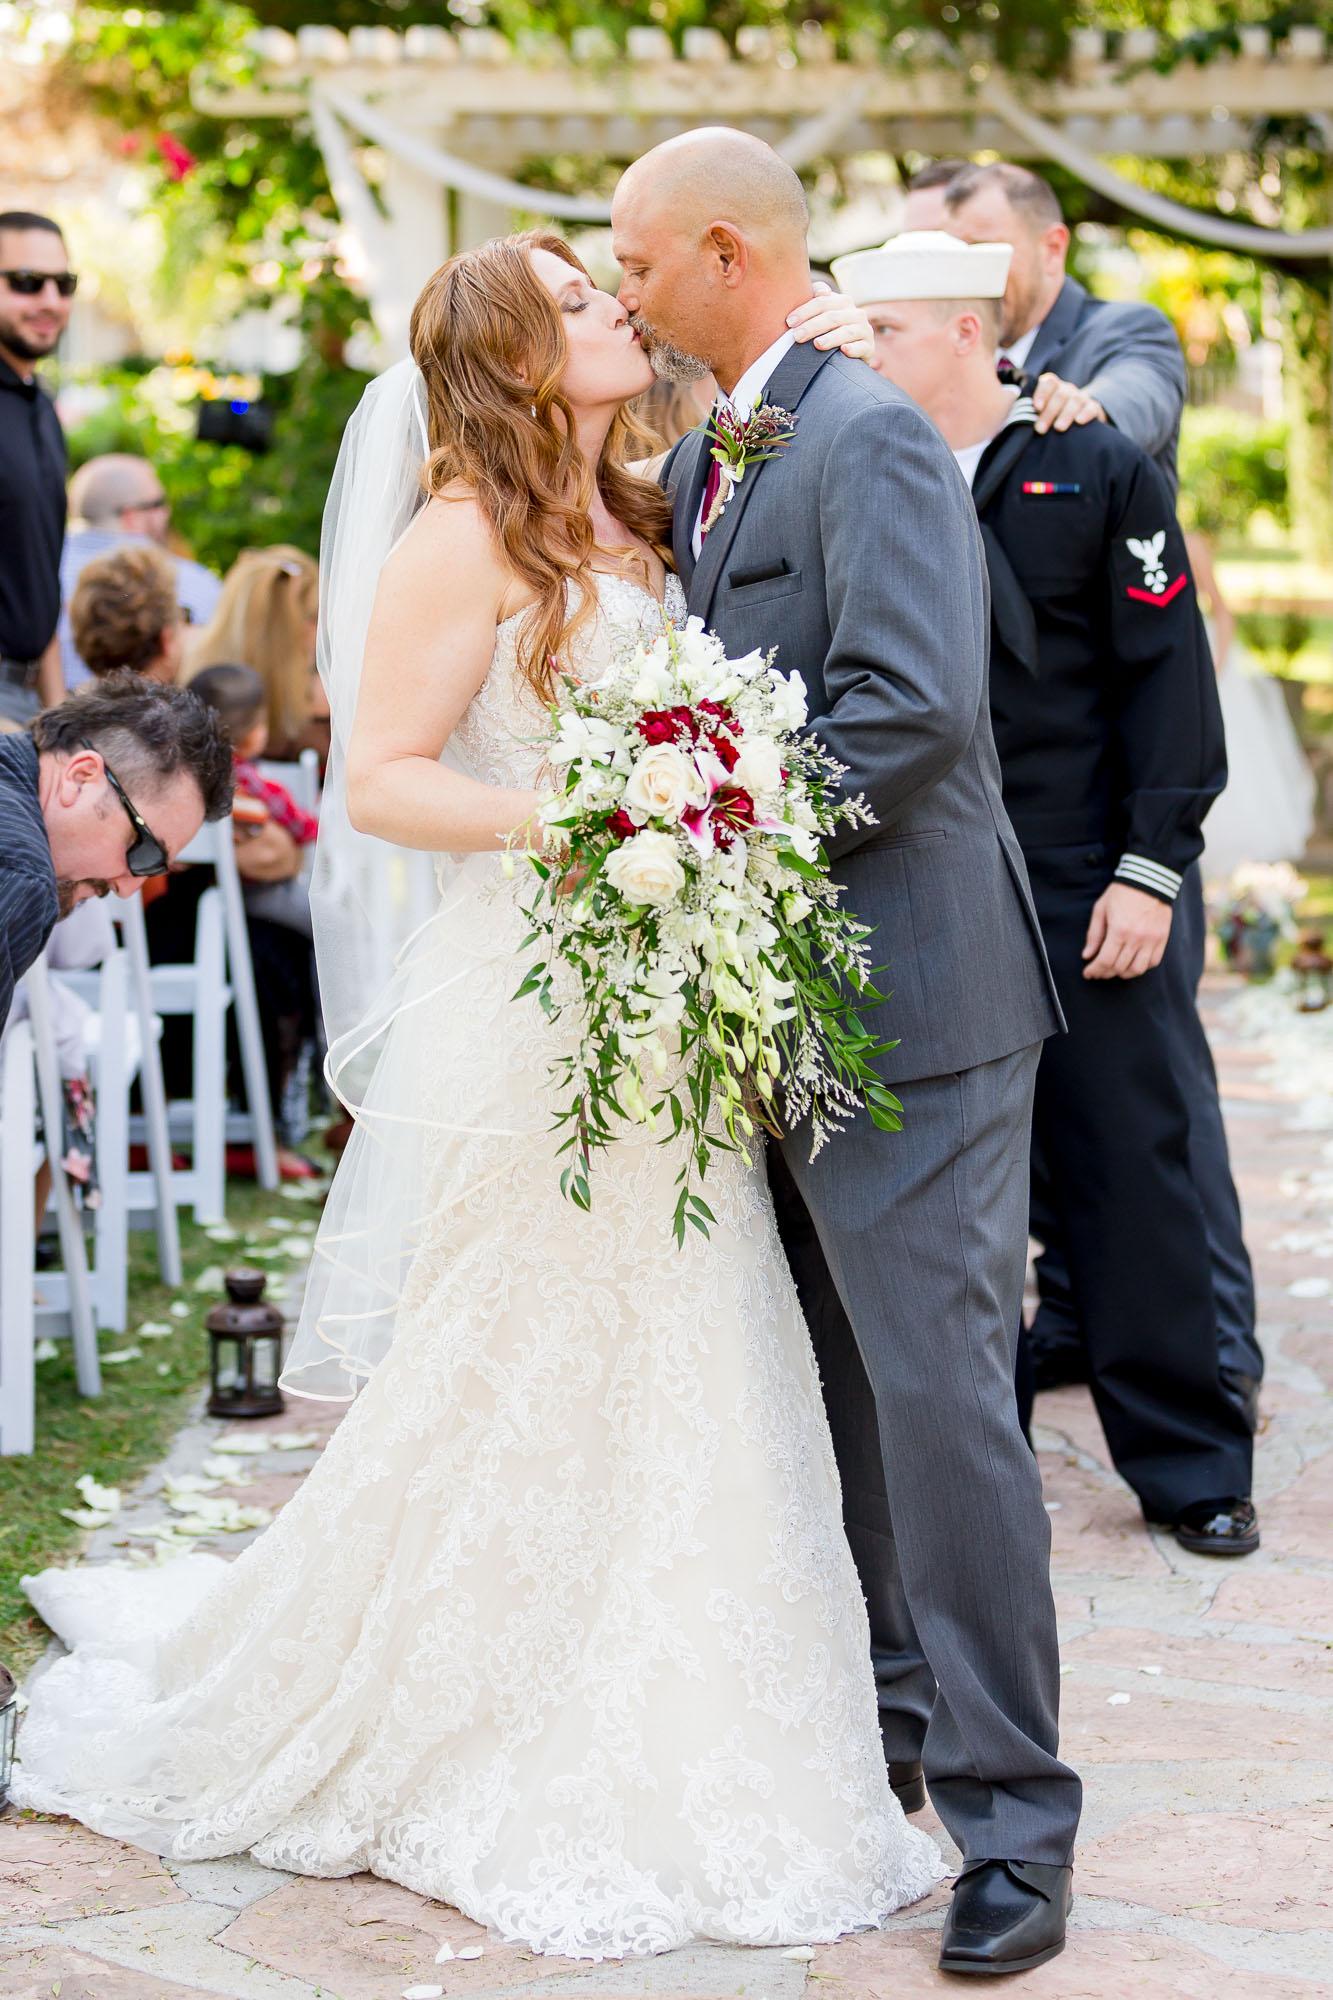 Heather_Pat_San_Marcos_Lakehouse_Wedding_416.jpg